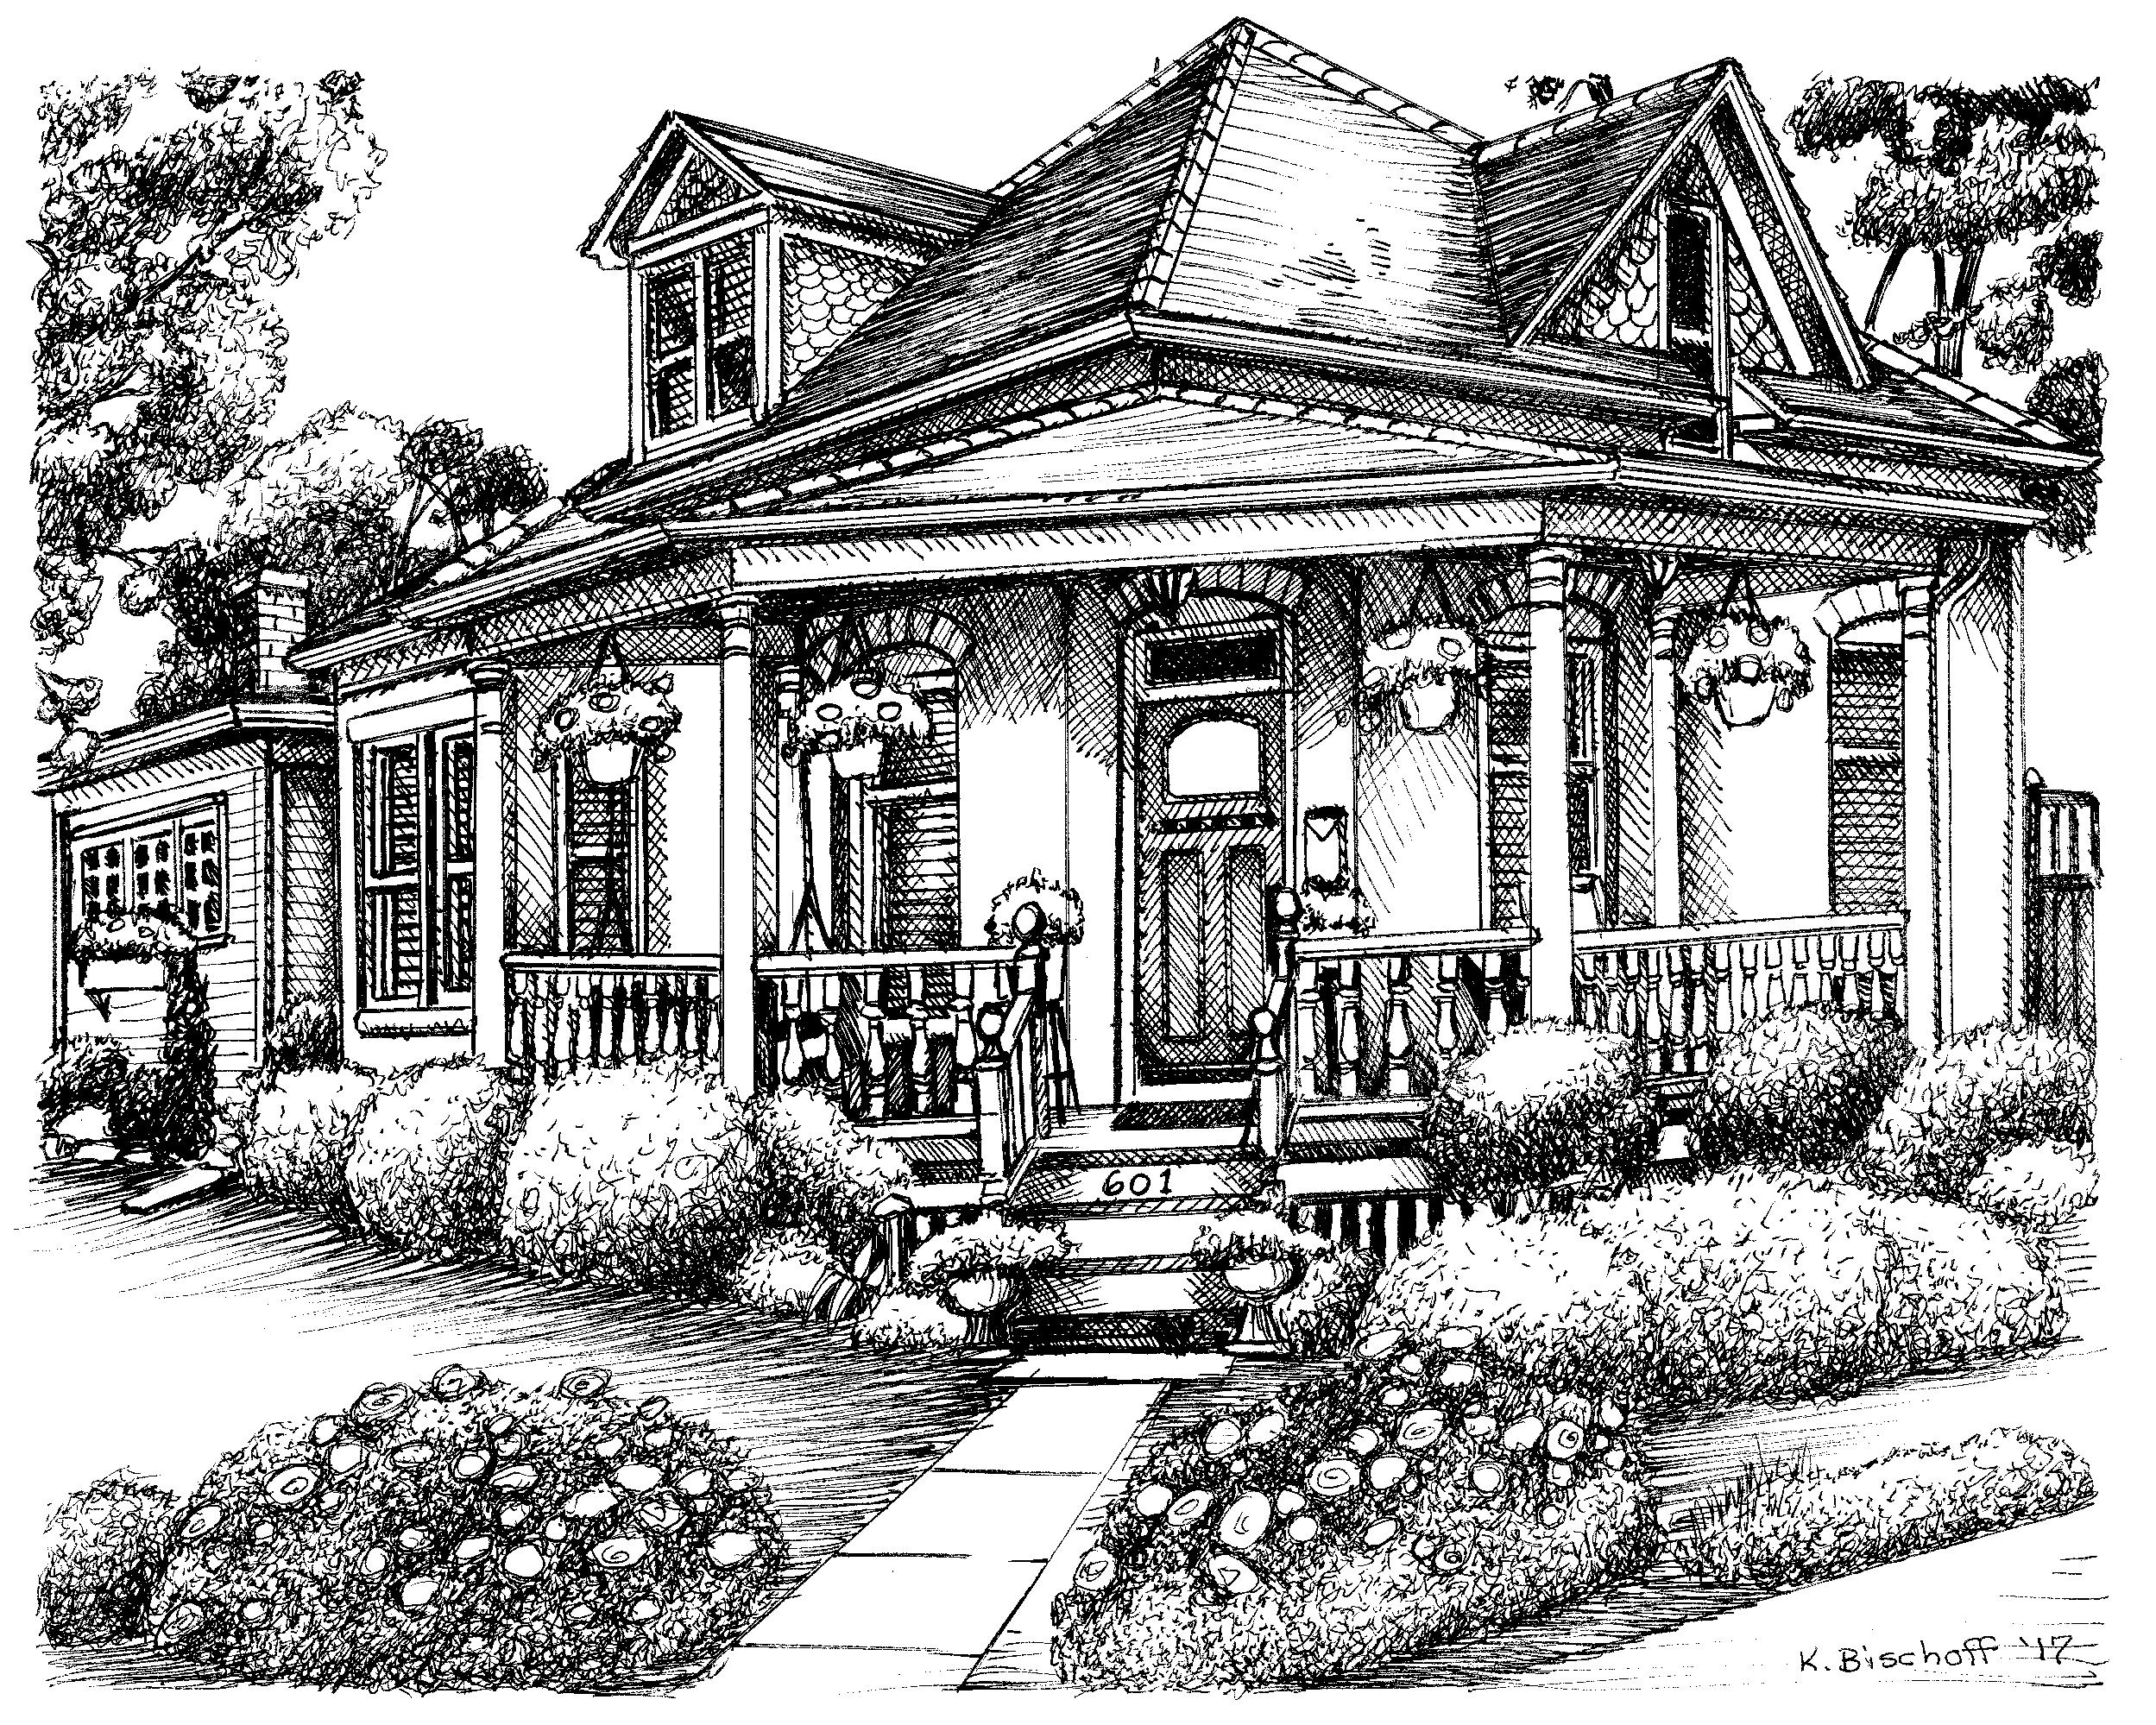 2017 Historic Homes Tour